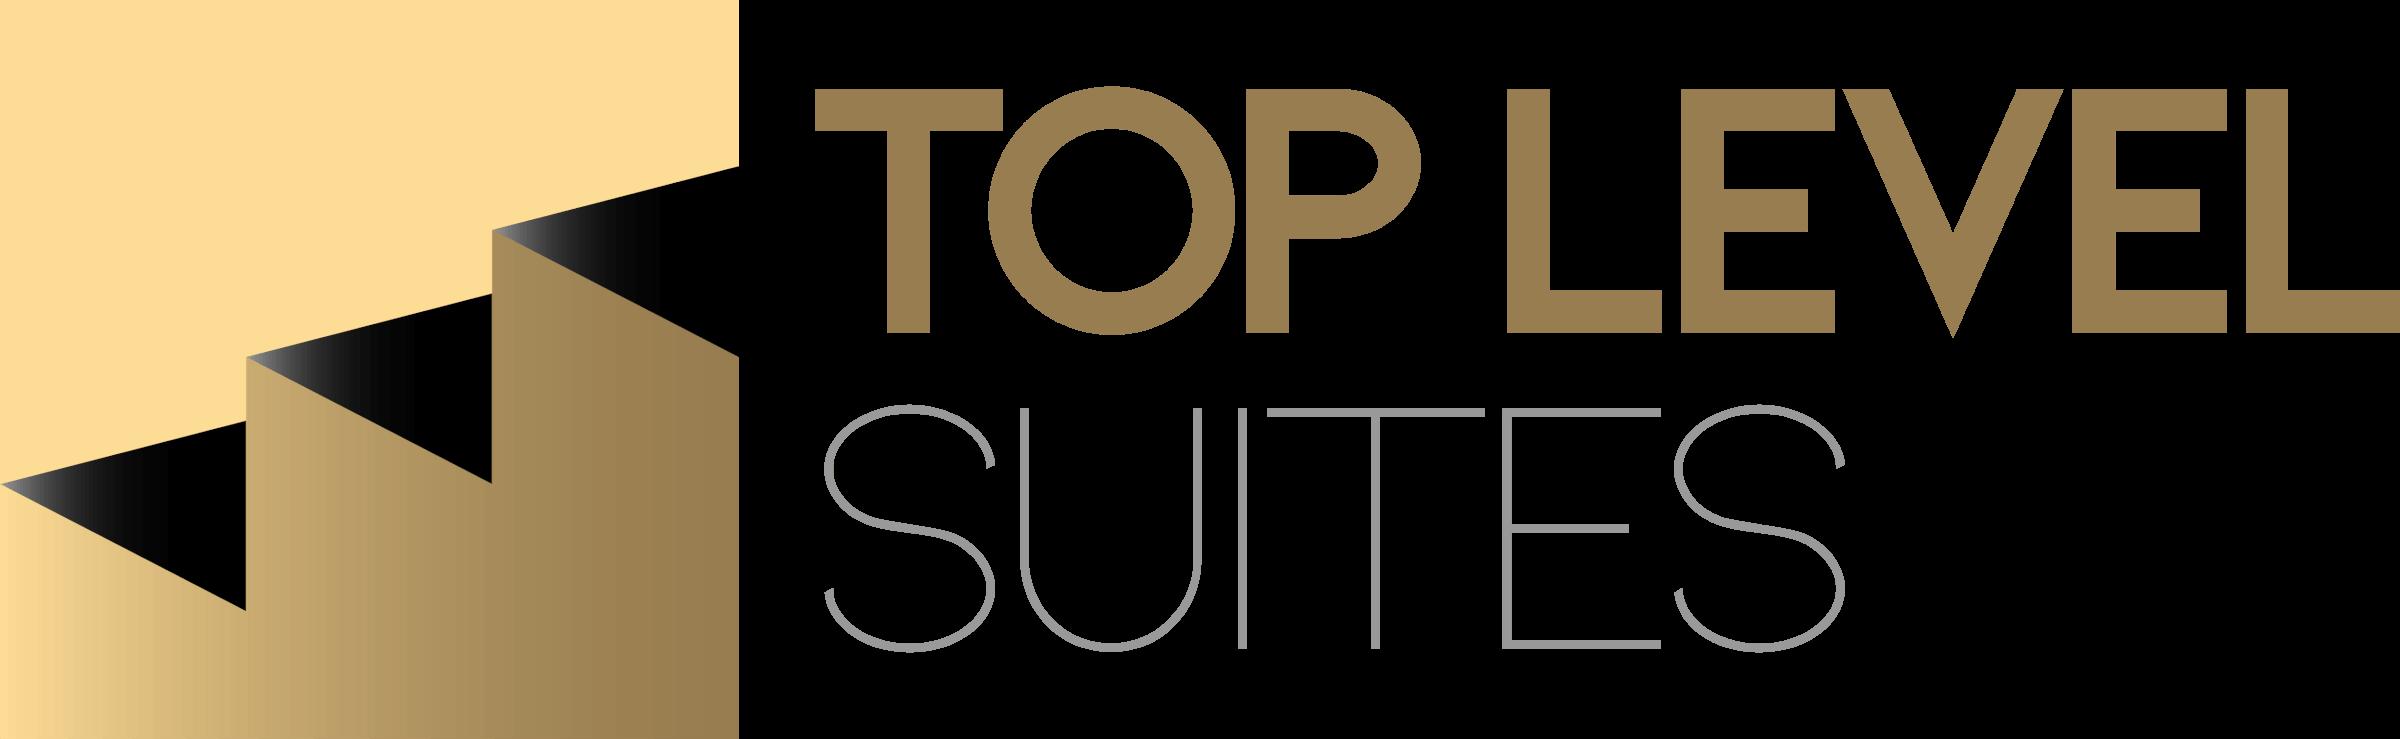 Top Level Suites